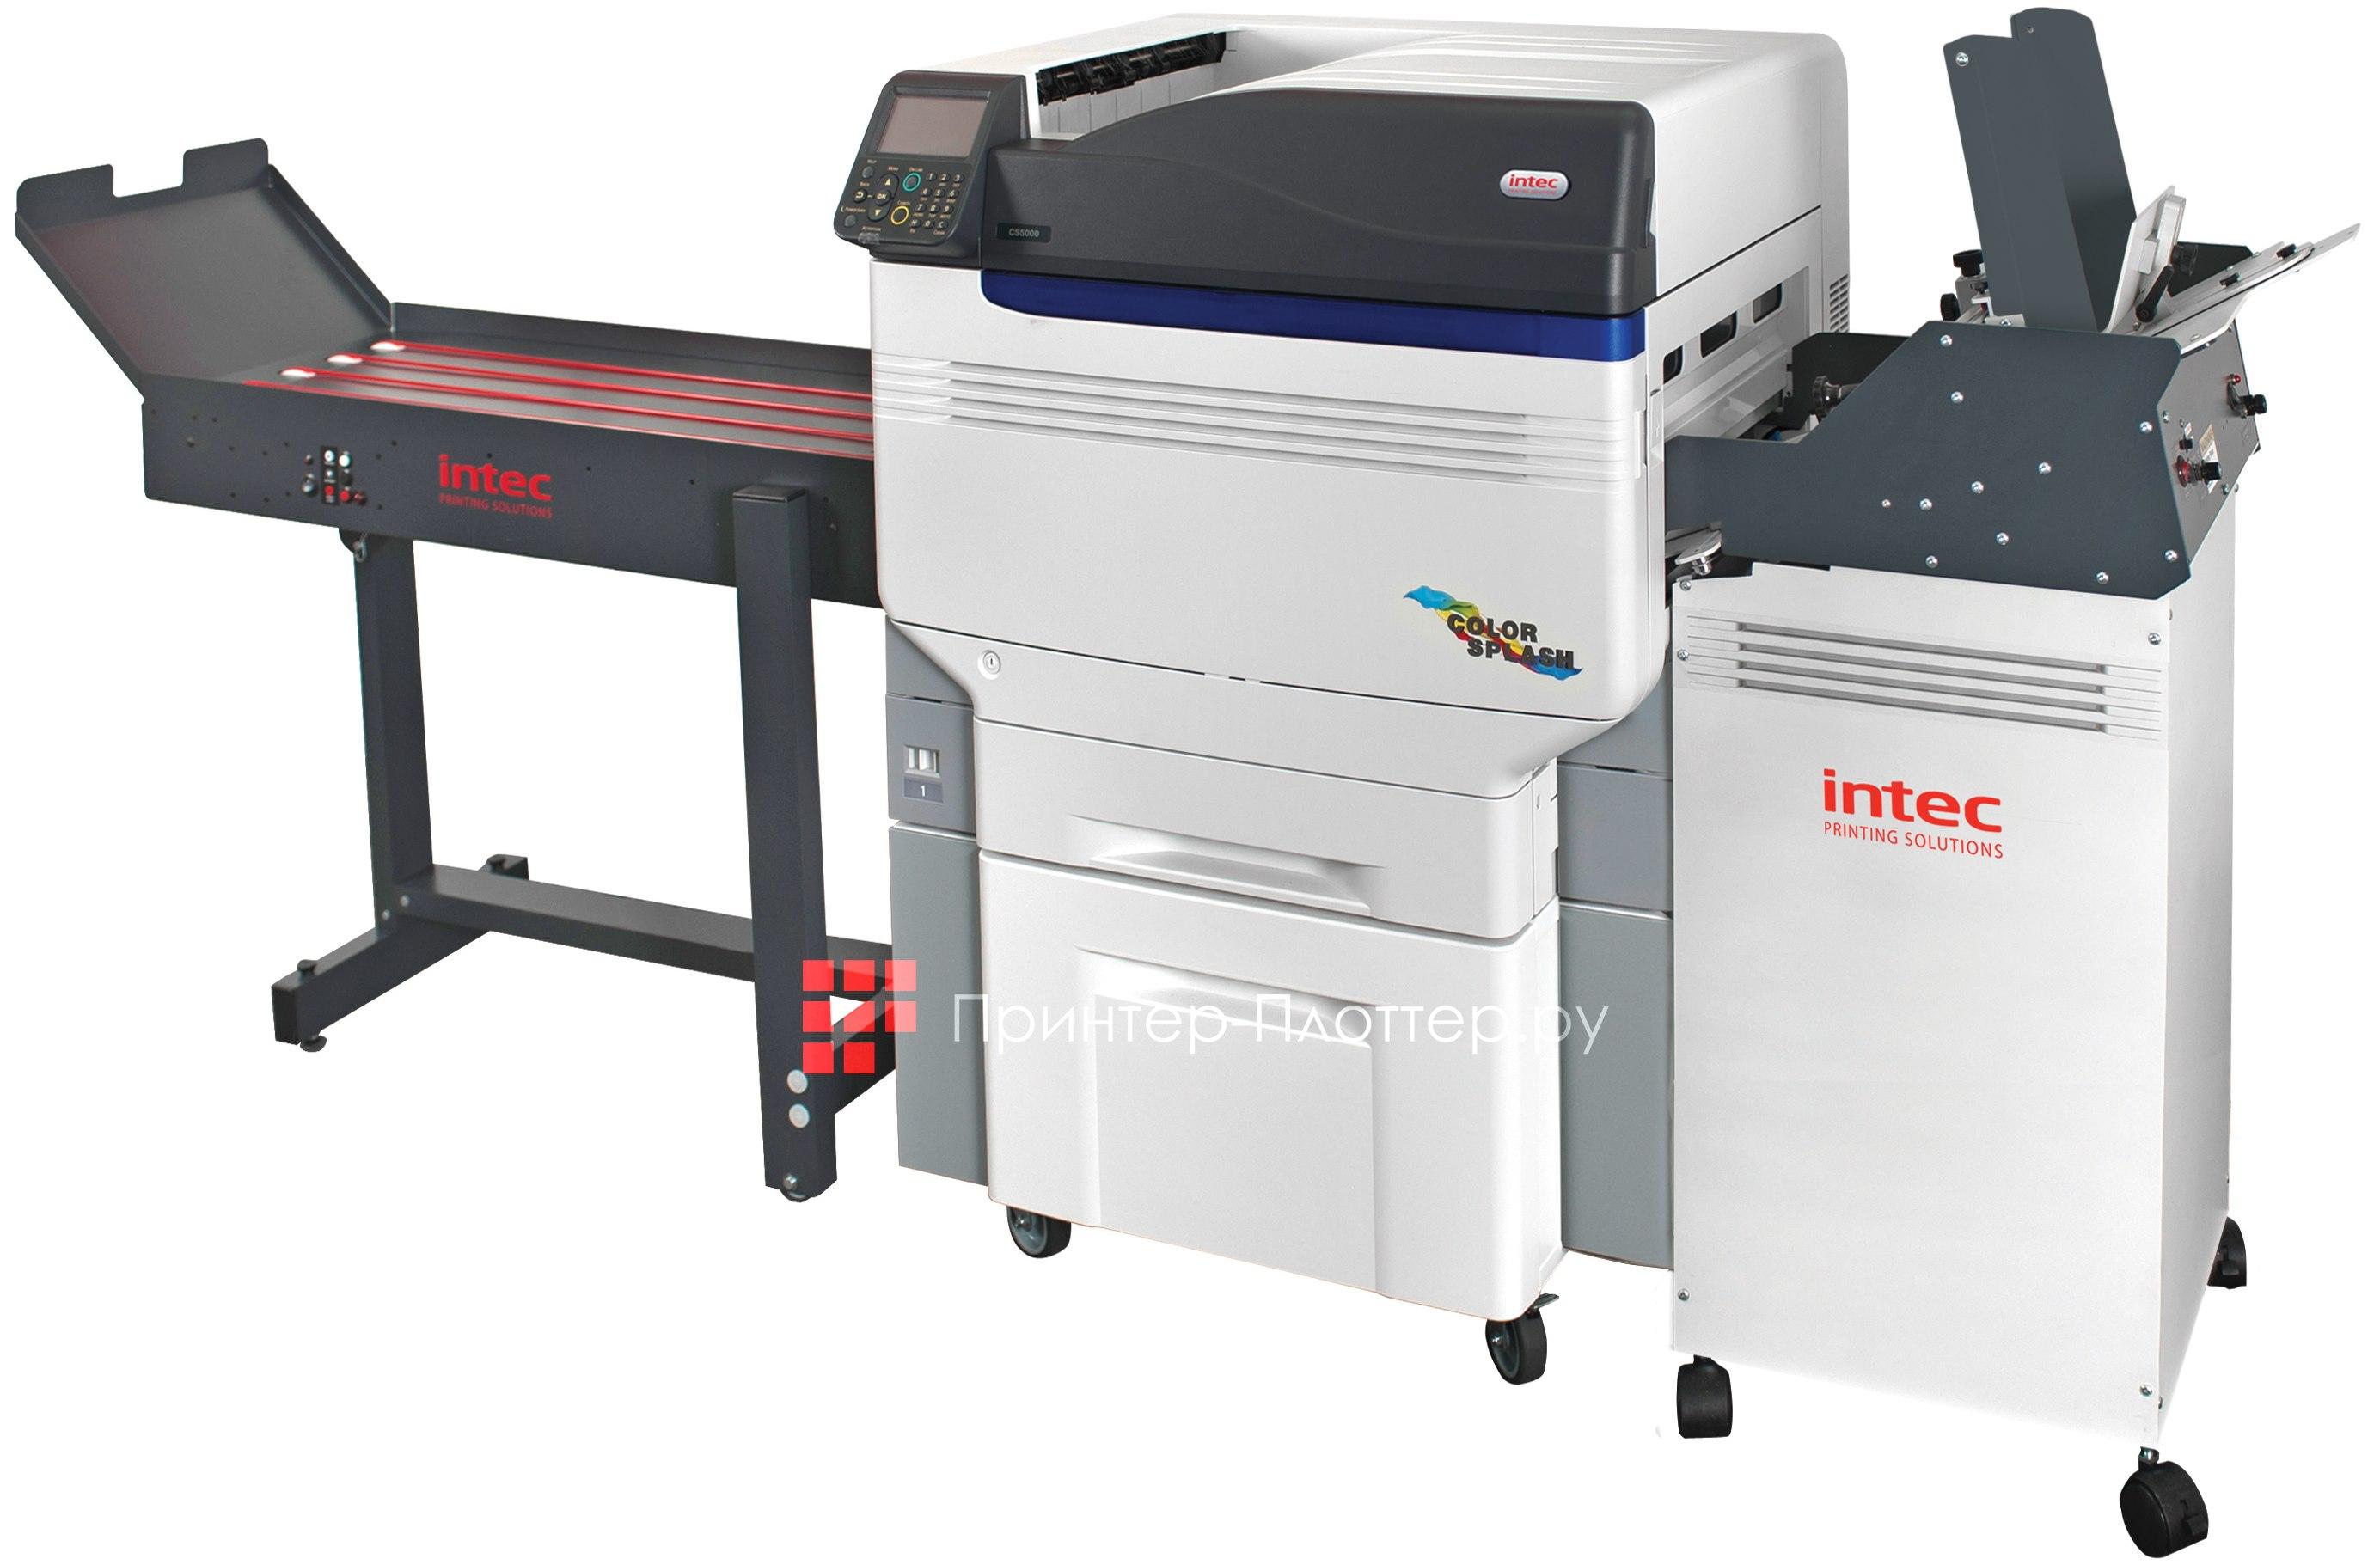 IntecColorSplash CS5000